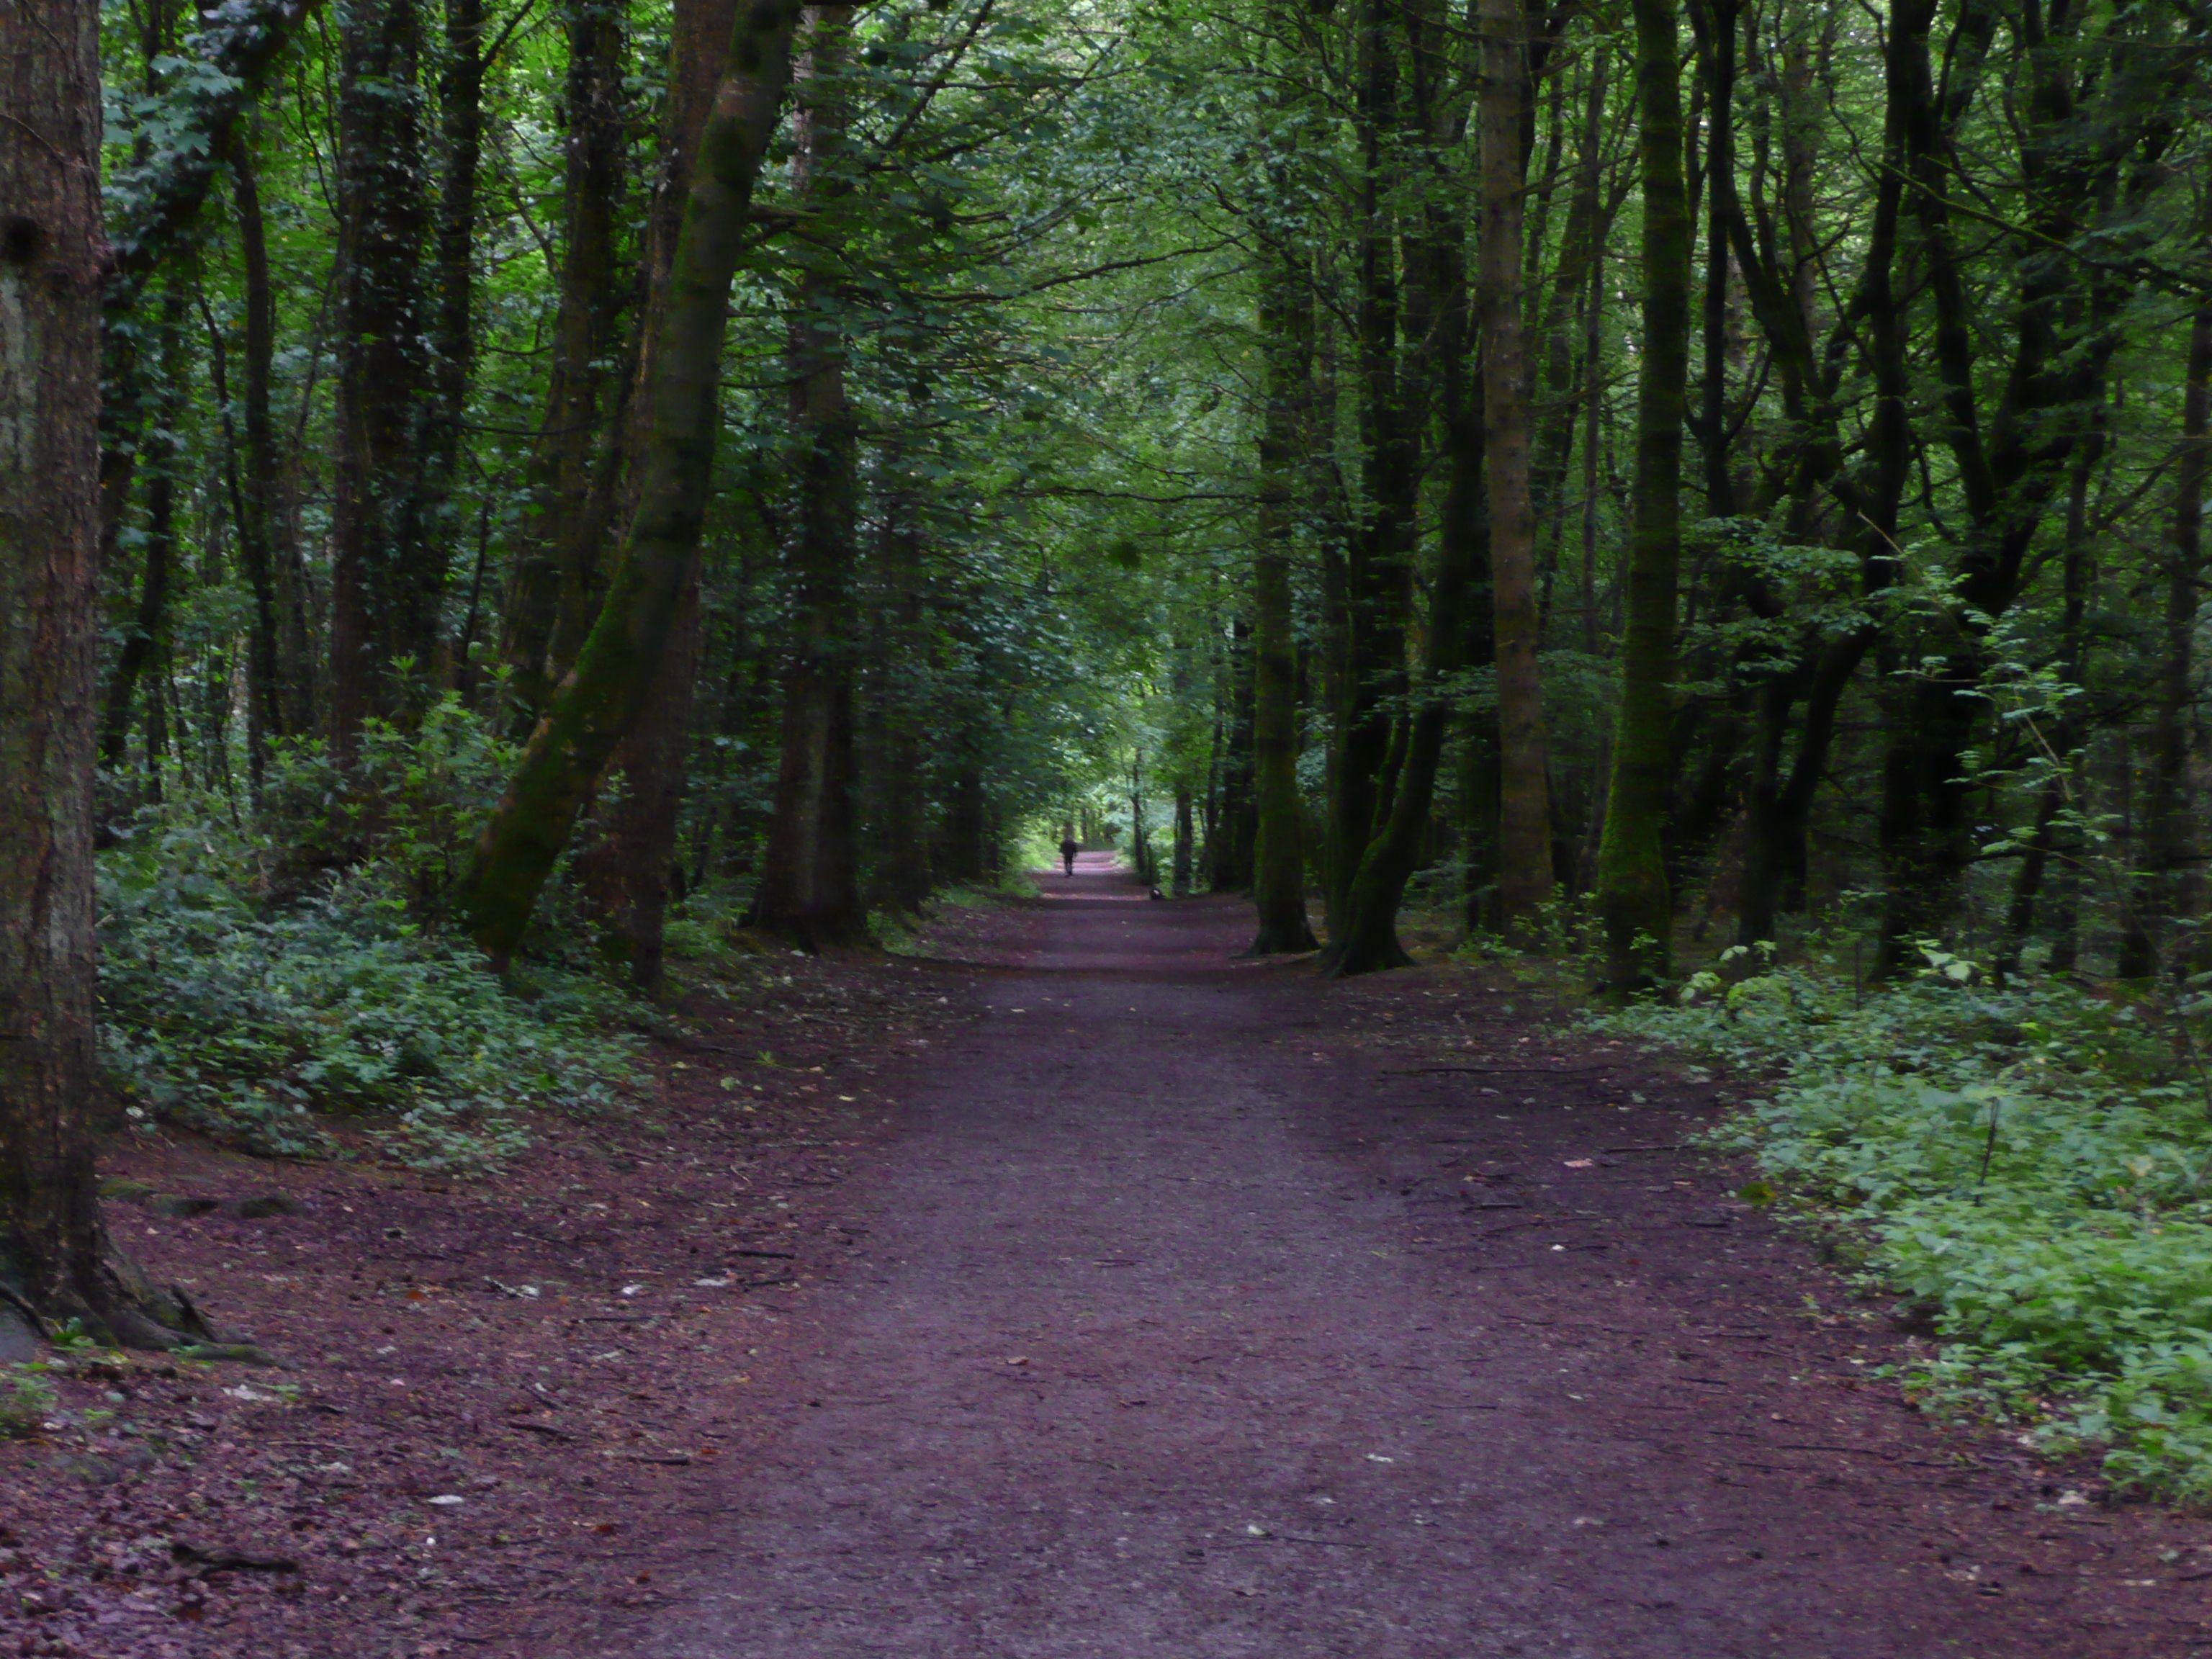 belleek woods ballina co mayo ireland favorite places